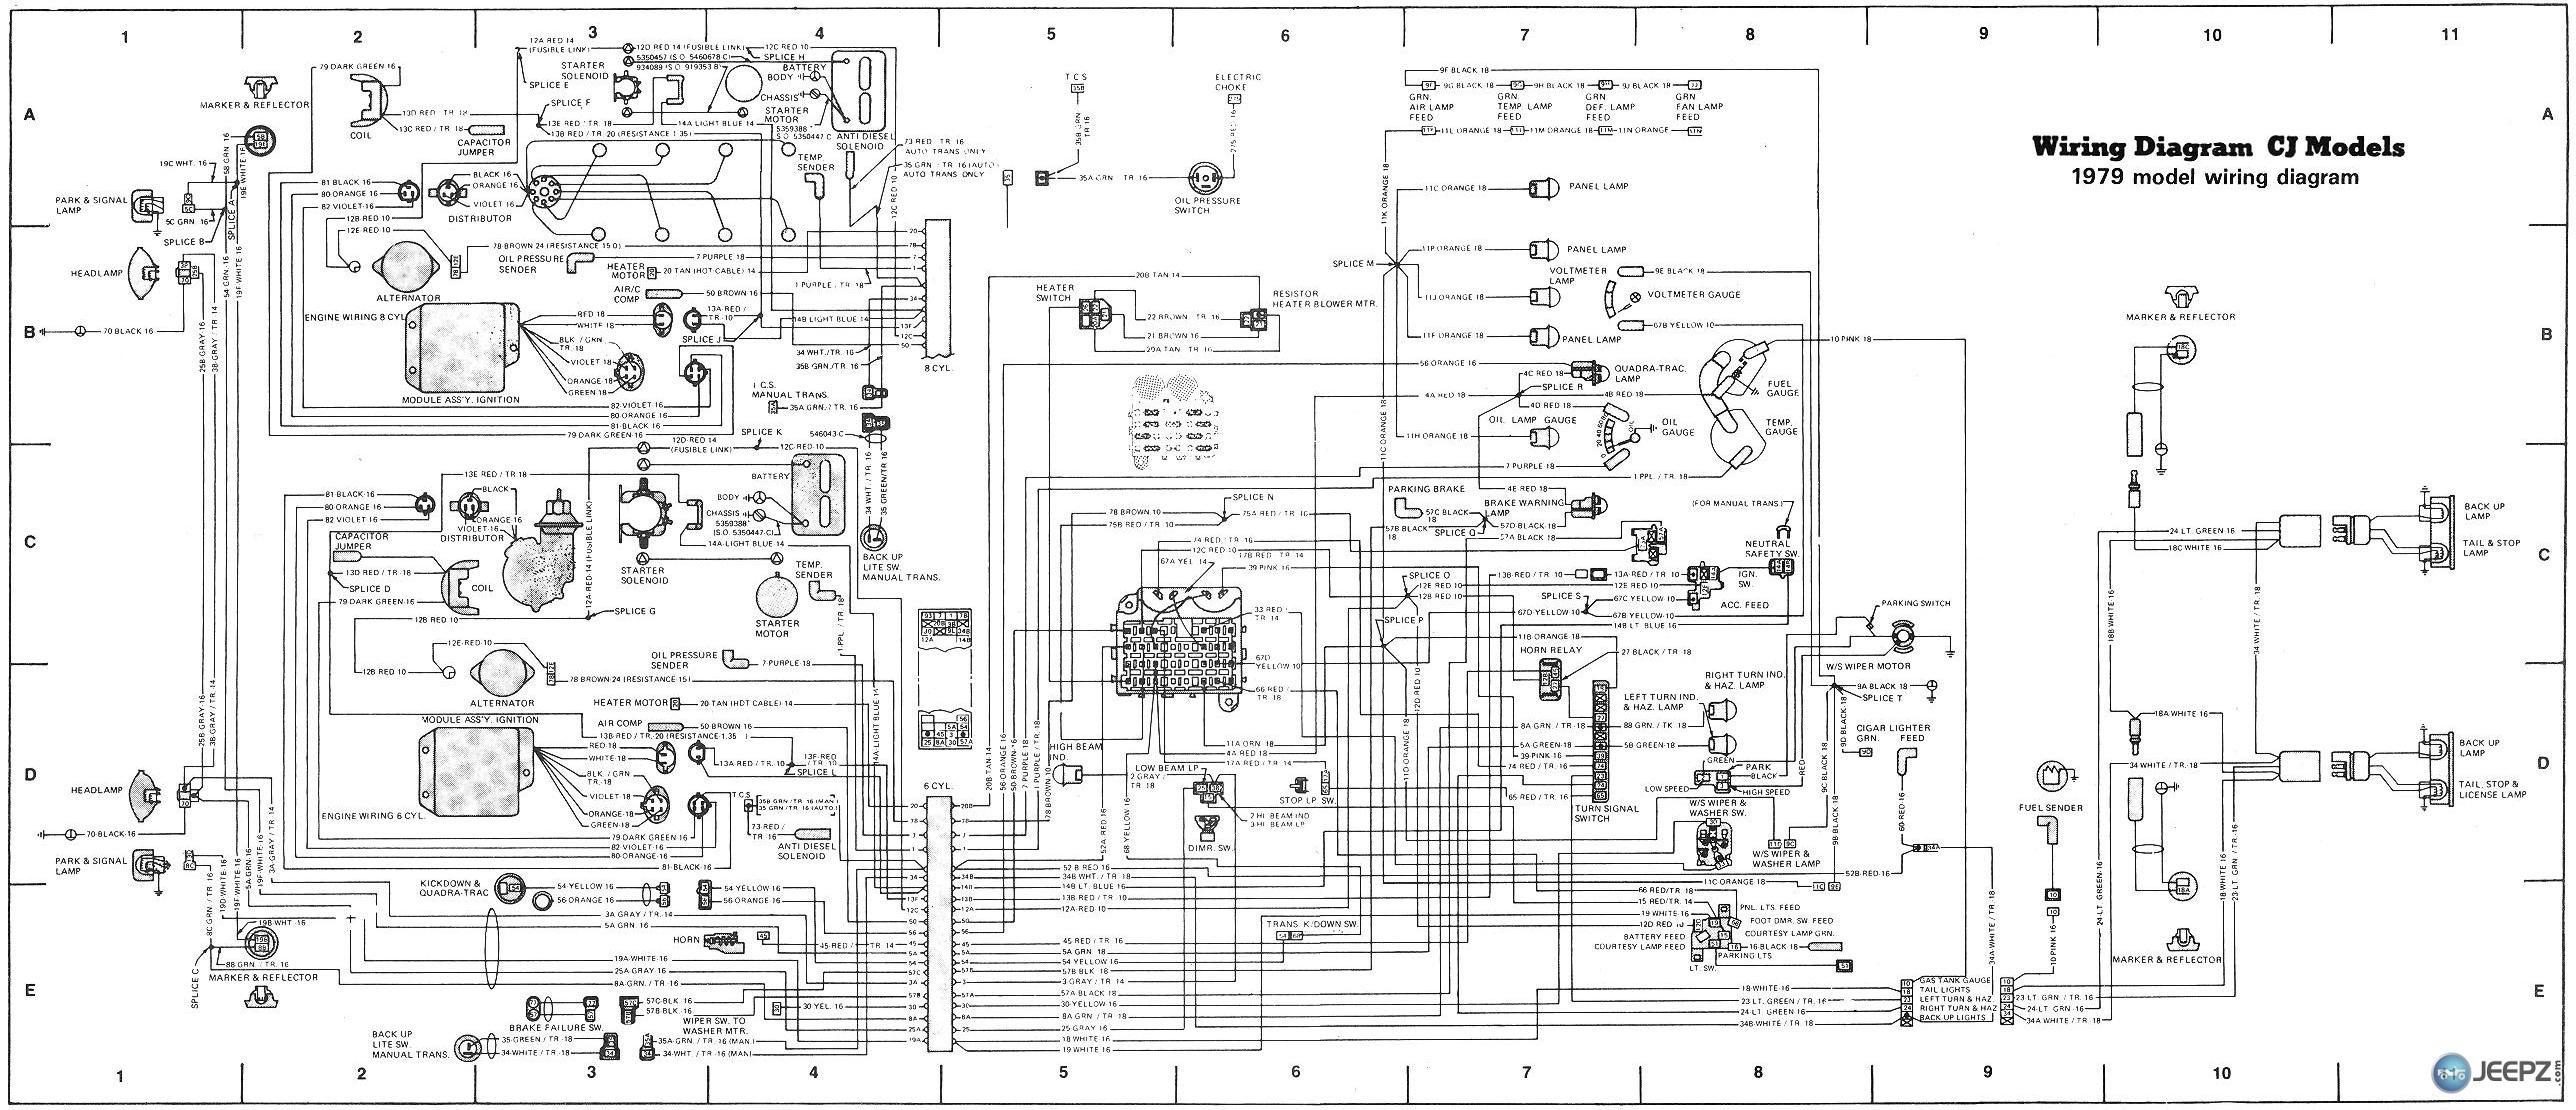 Dual Xdm6820 Wiring Diagram from i0.wp.com